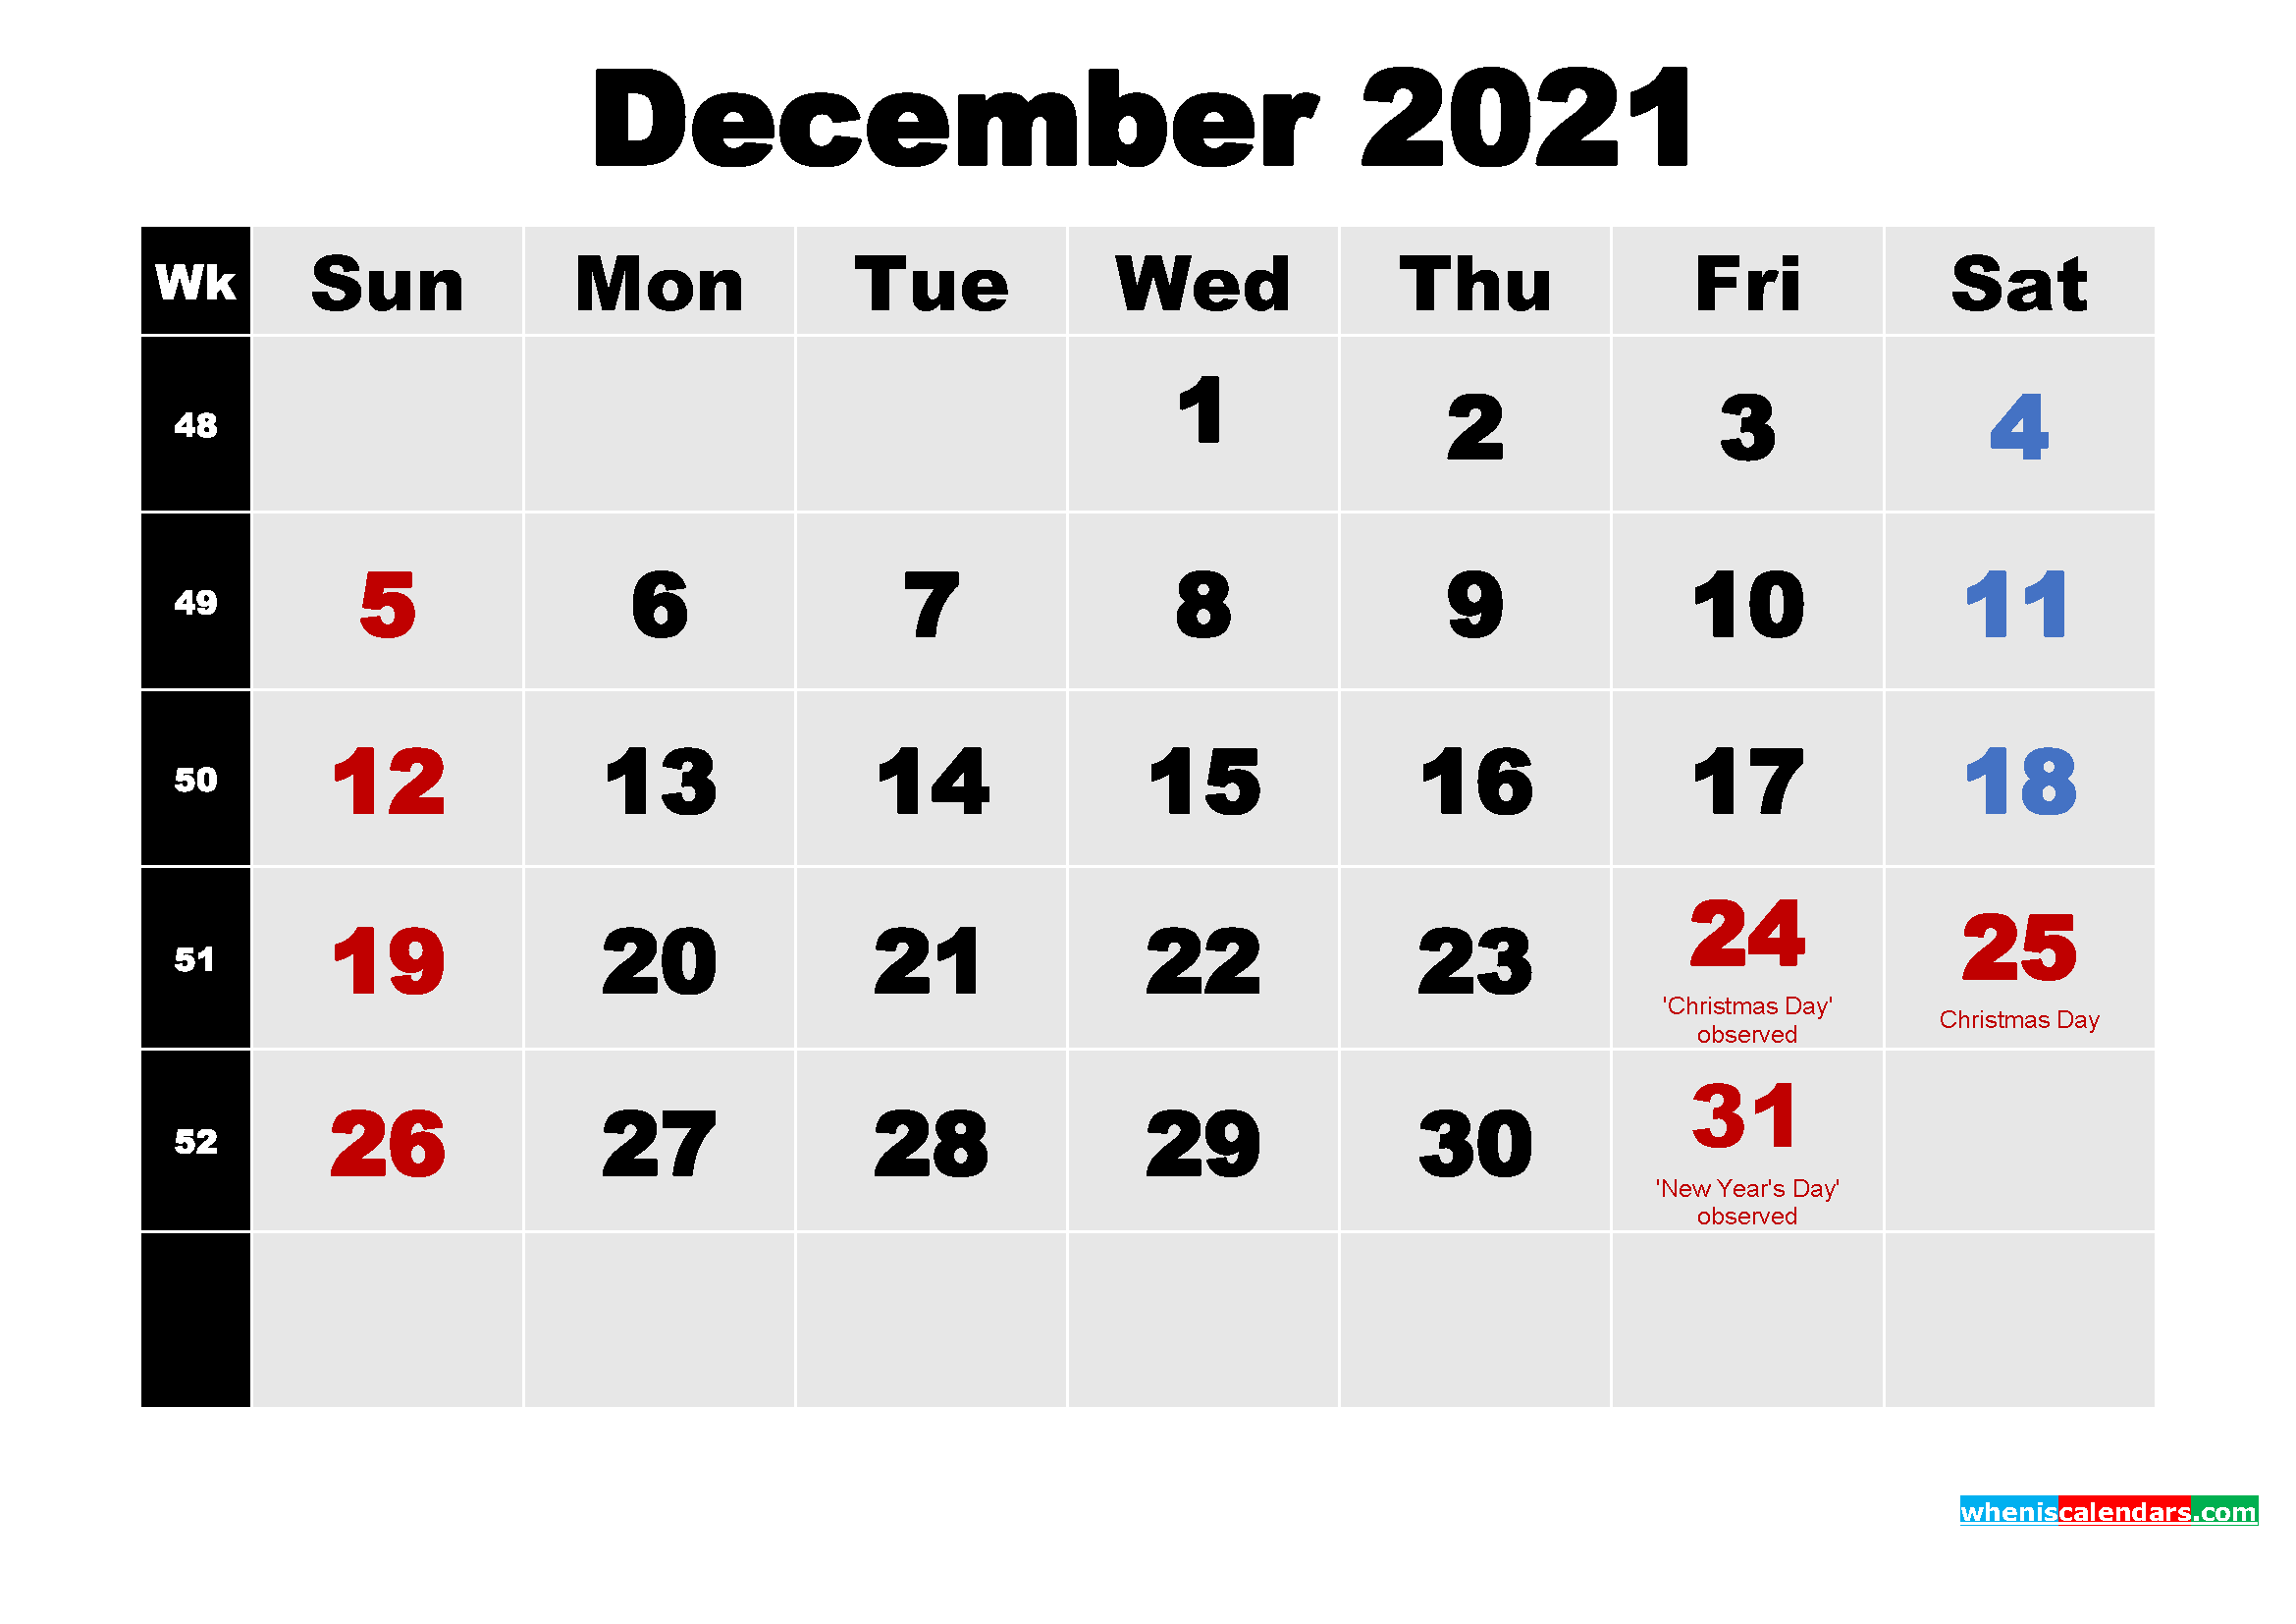 December 2021 Calendar with Holidays Wallpaper